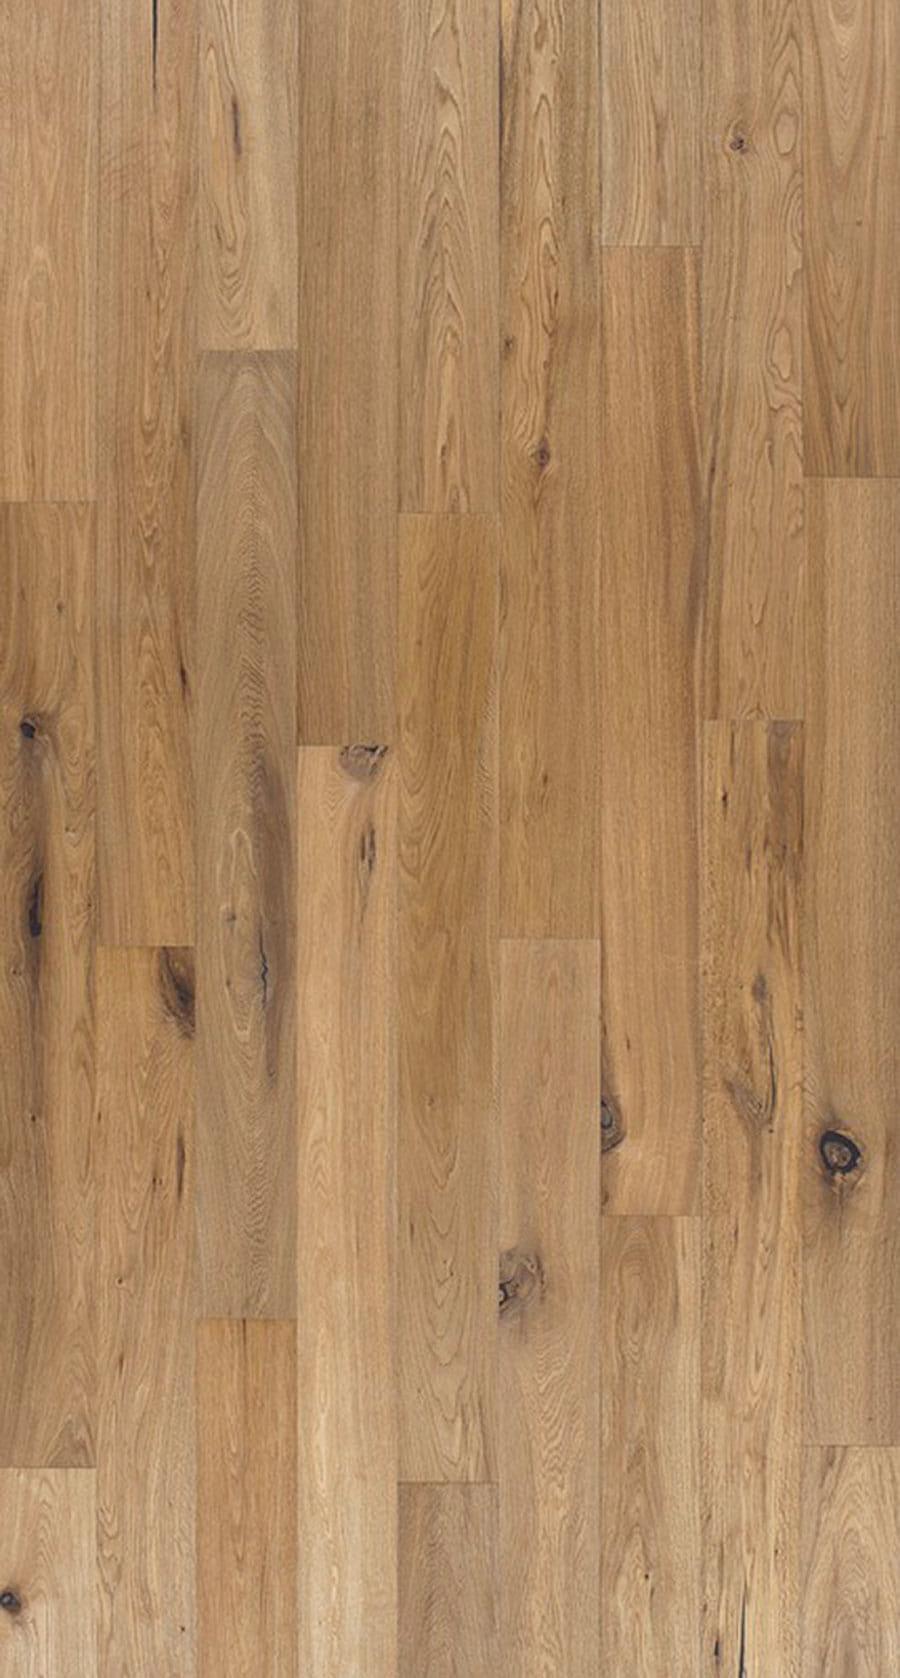 Kahrs Spirit Hardwood Flooring Rugged Crater Oak